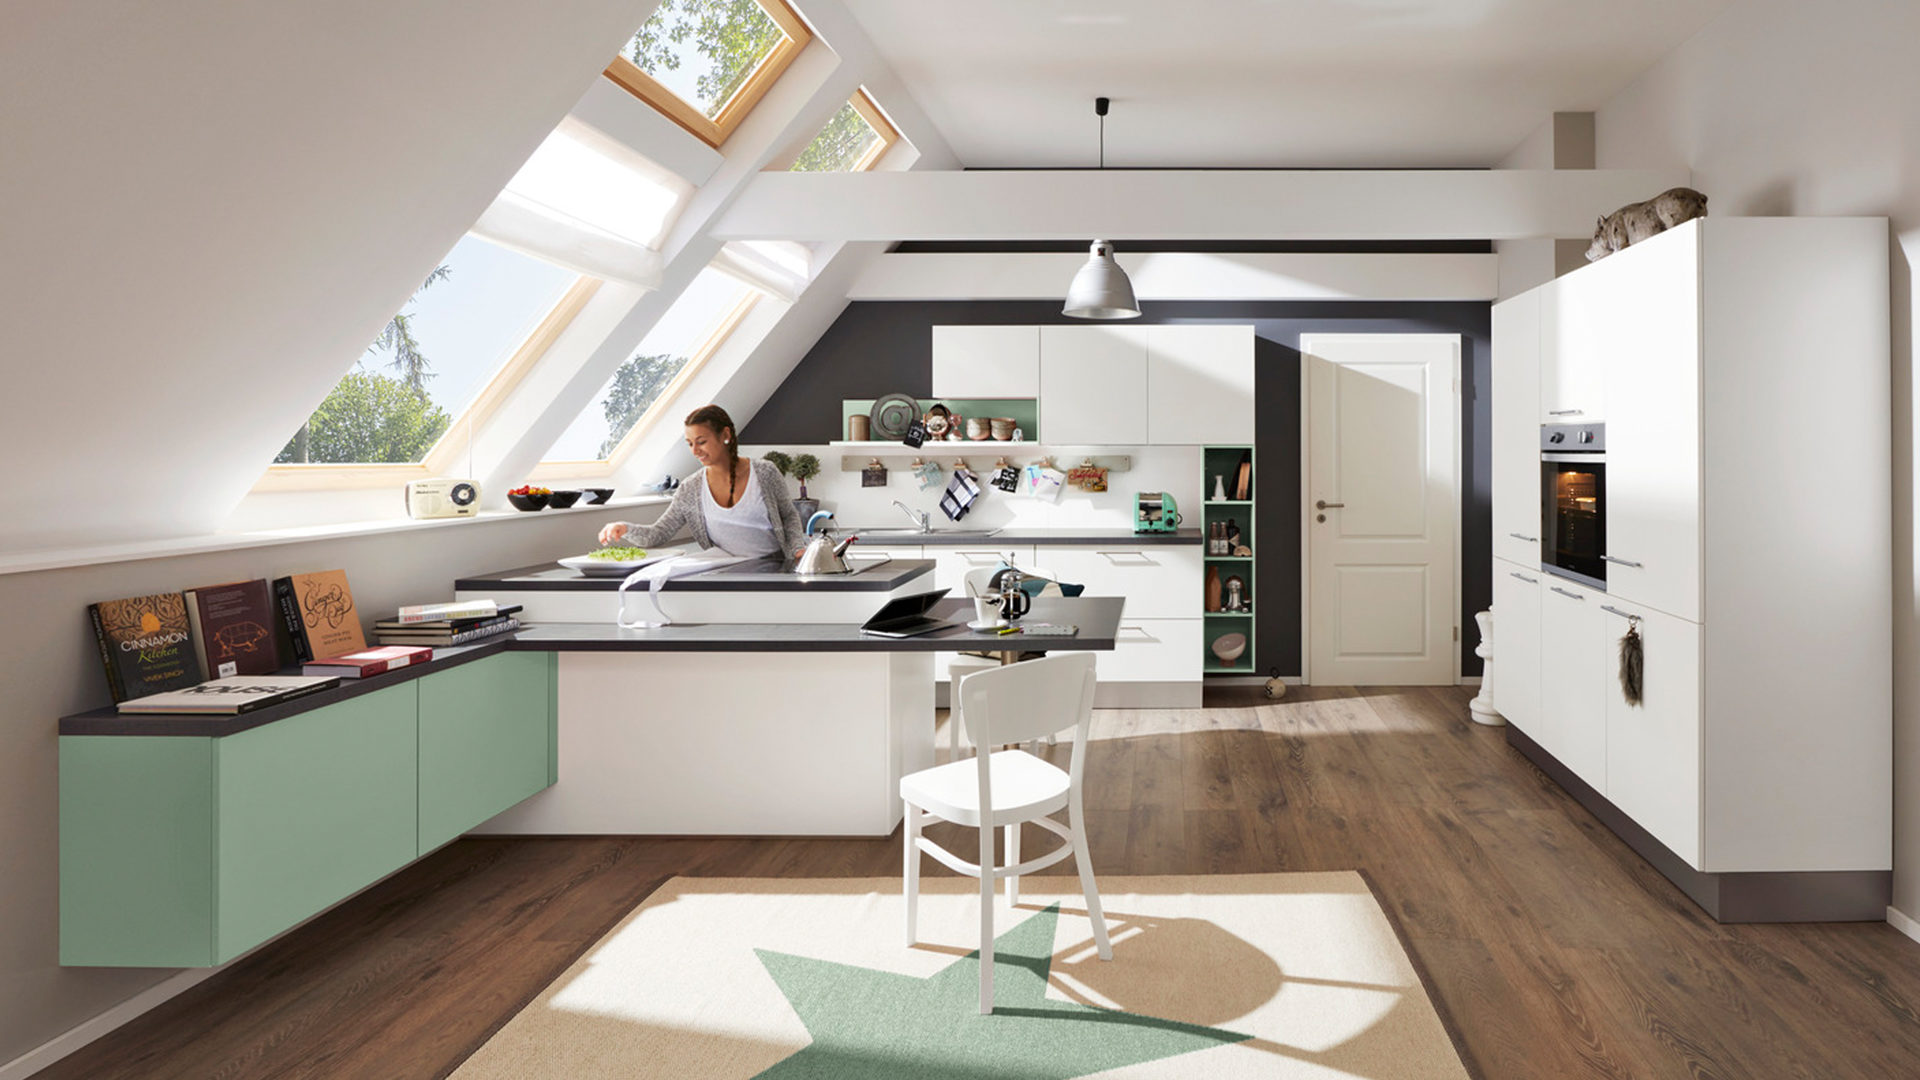 Stunning Küchen Herzer St Ingbert Ideas - Globexusa.us - globexusa.us